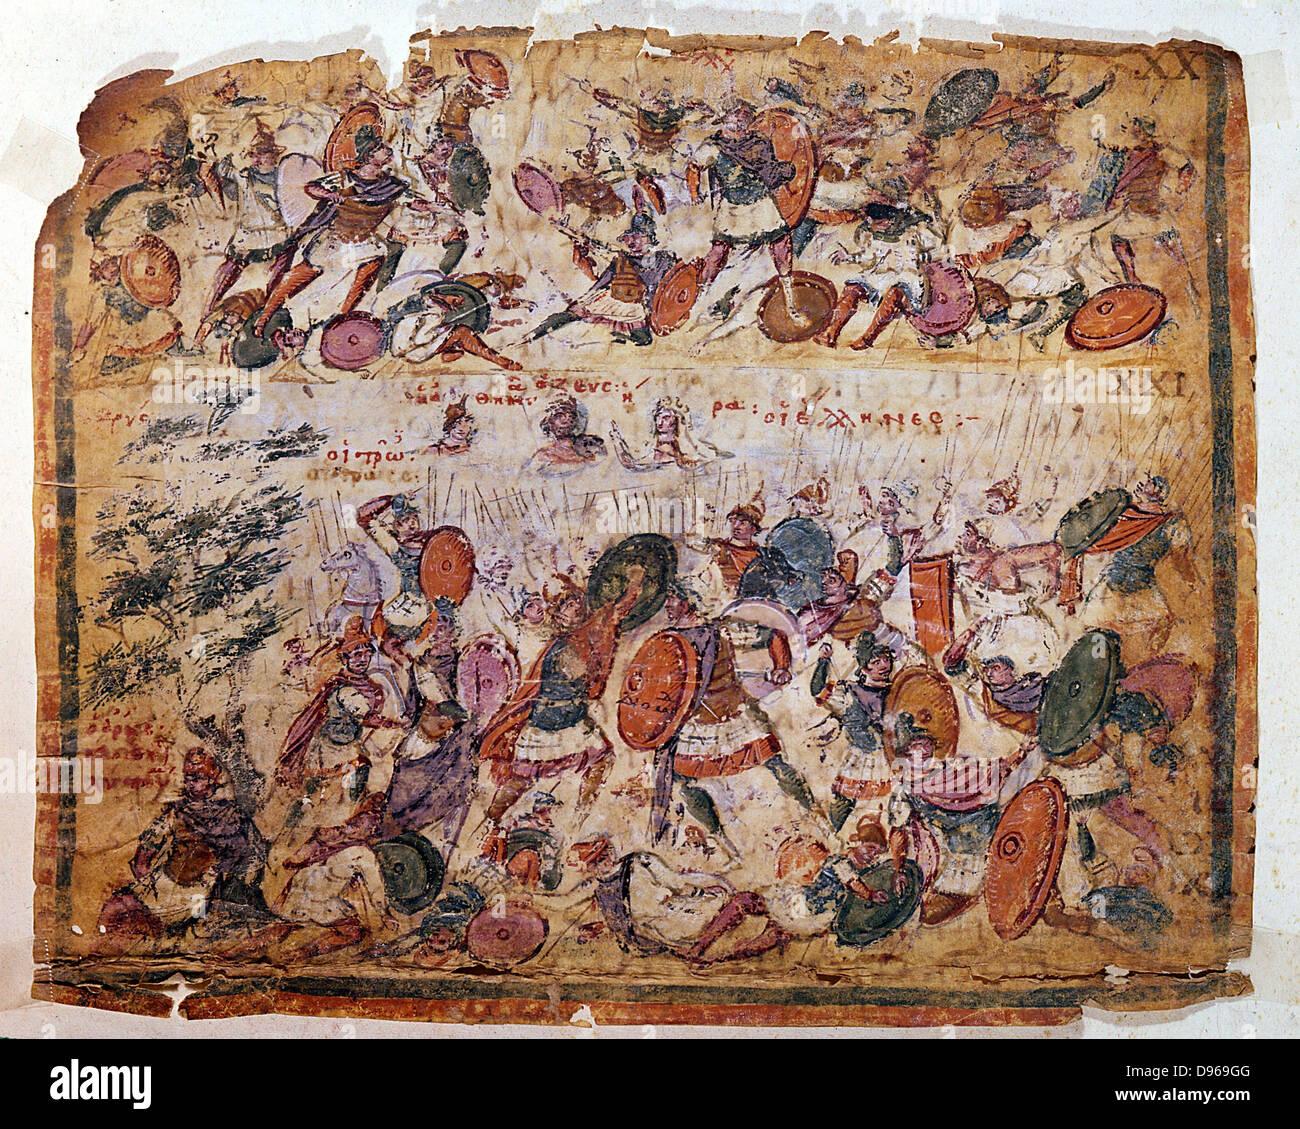 Battle scene from a manuscript of Homer 'Iliad' c300 AD. Biblioteca Ambrosiana Milan. - Stock Image